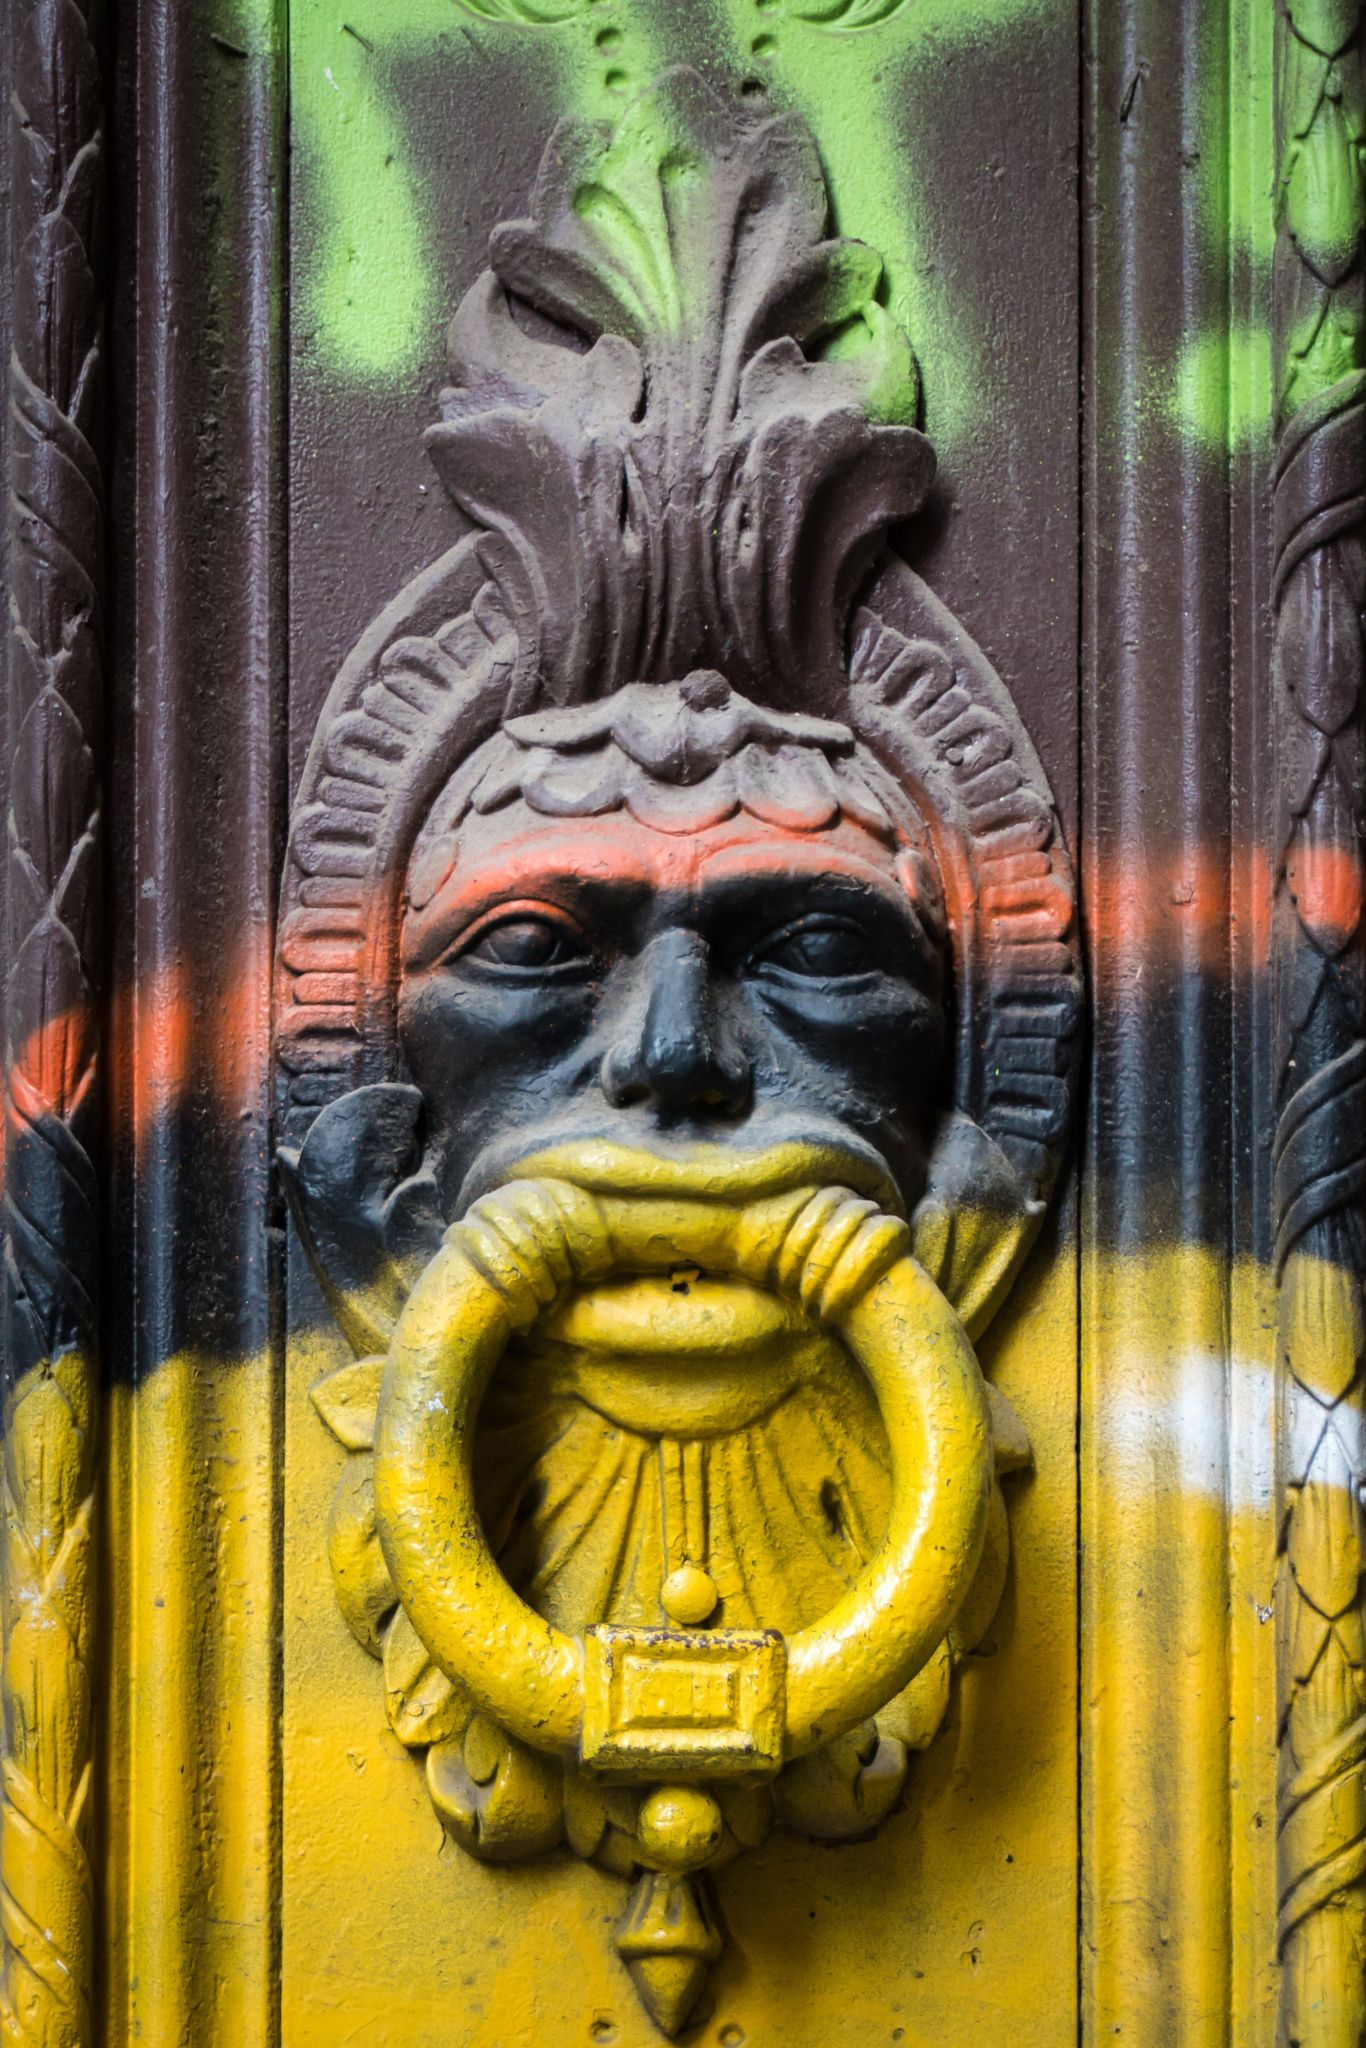 Old Spanish Door Knocker With Graffiti By Irmgard Sabet Wasinger.